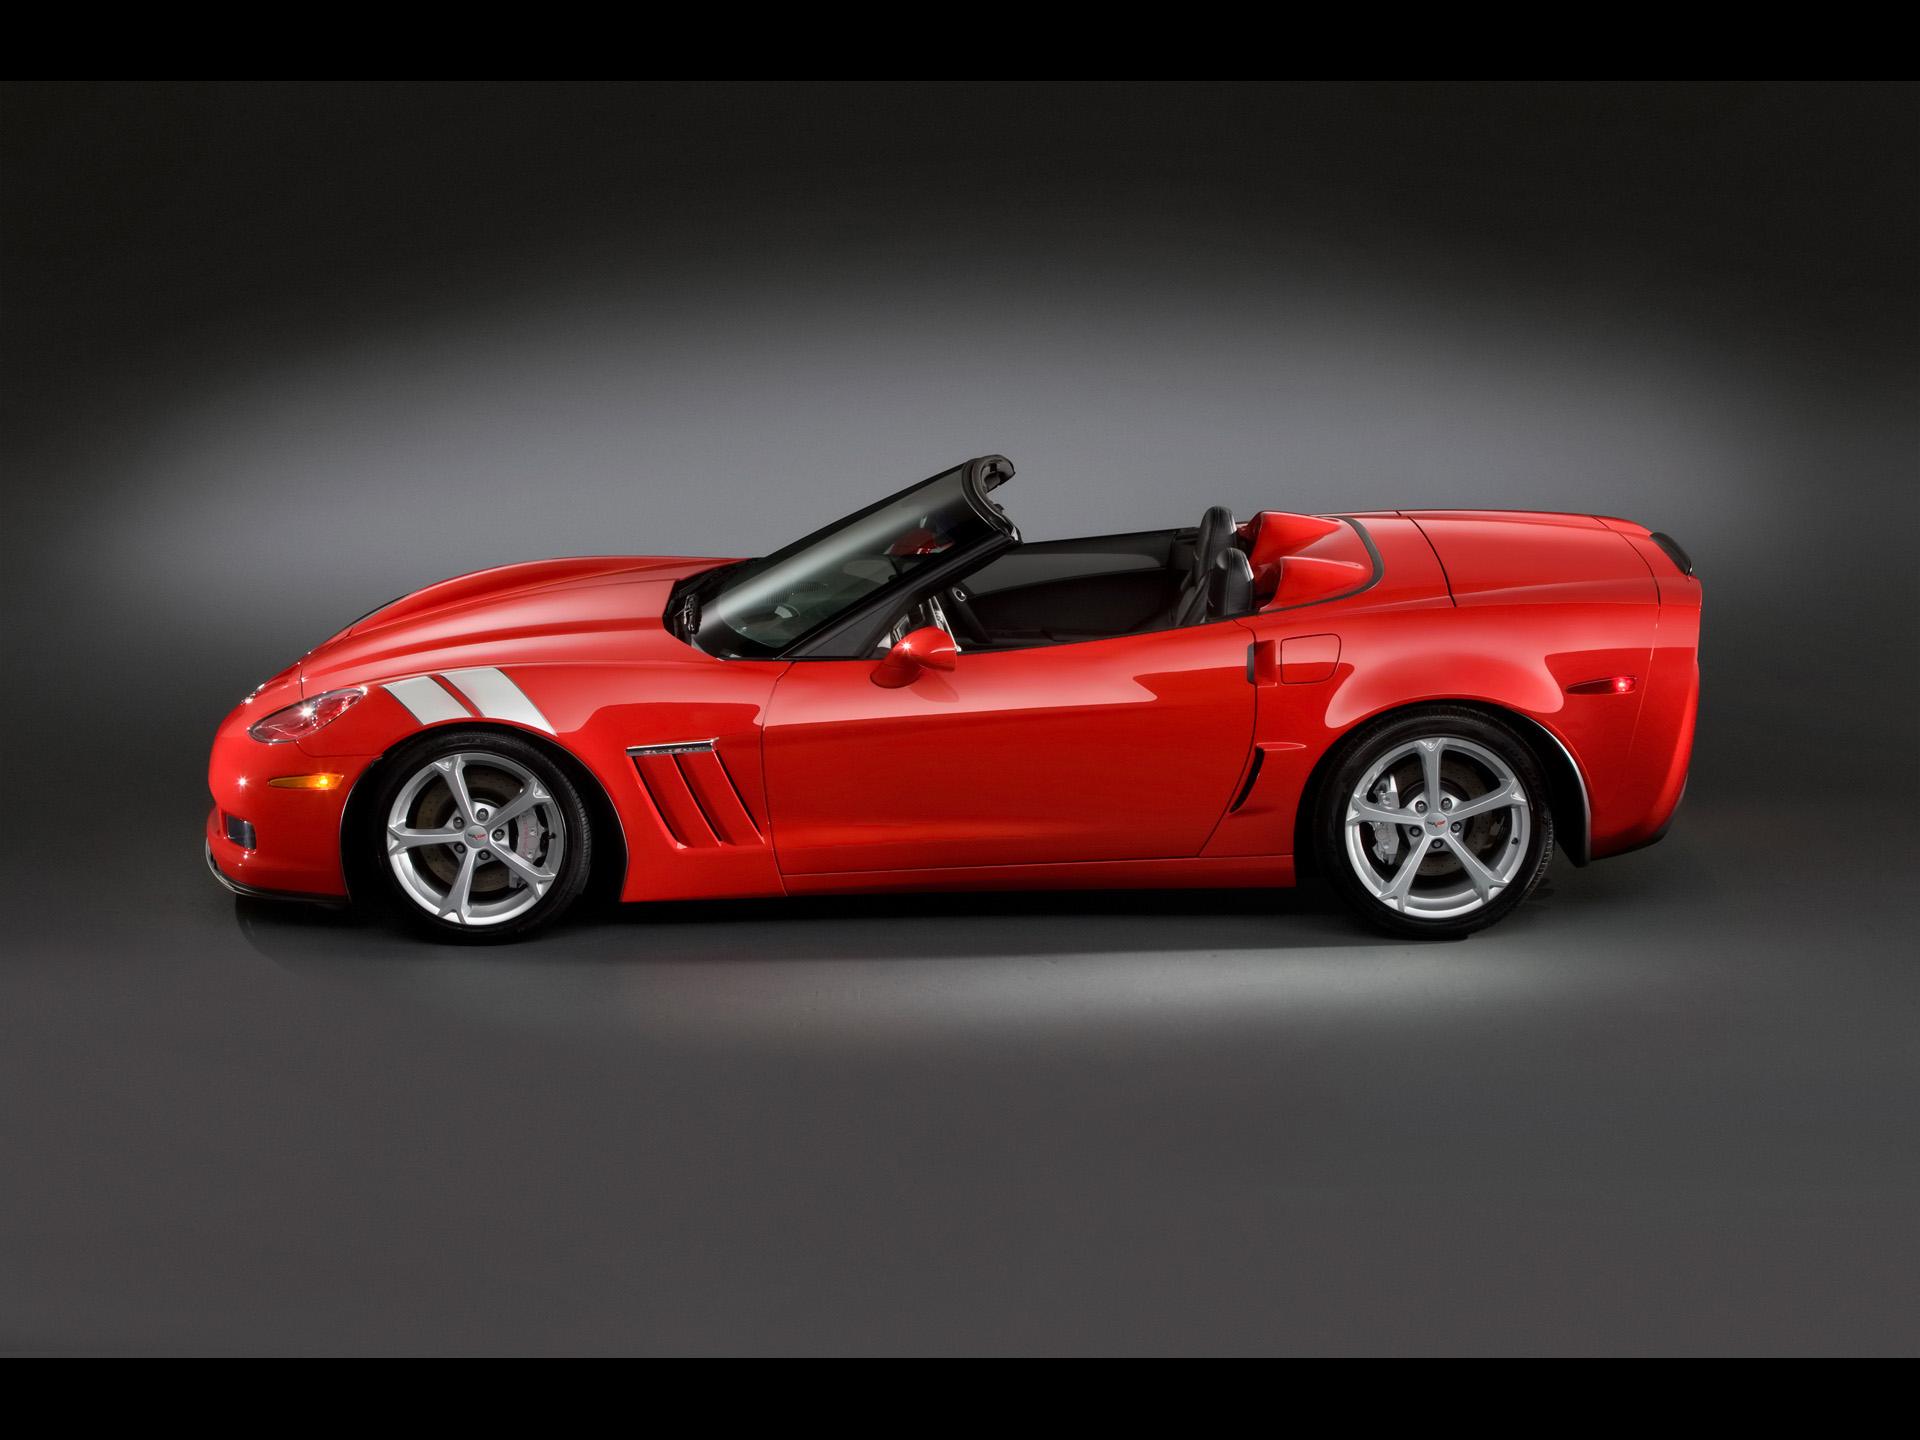 1920x1440 Corvette side desktop PC and Mac wallpaper 1920x1440